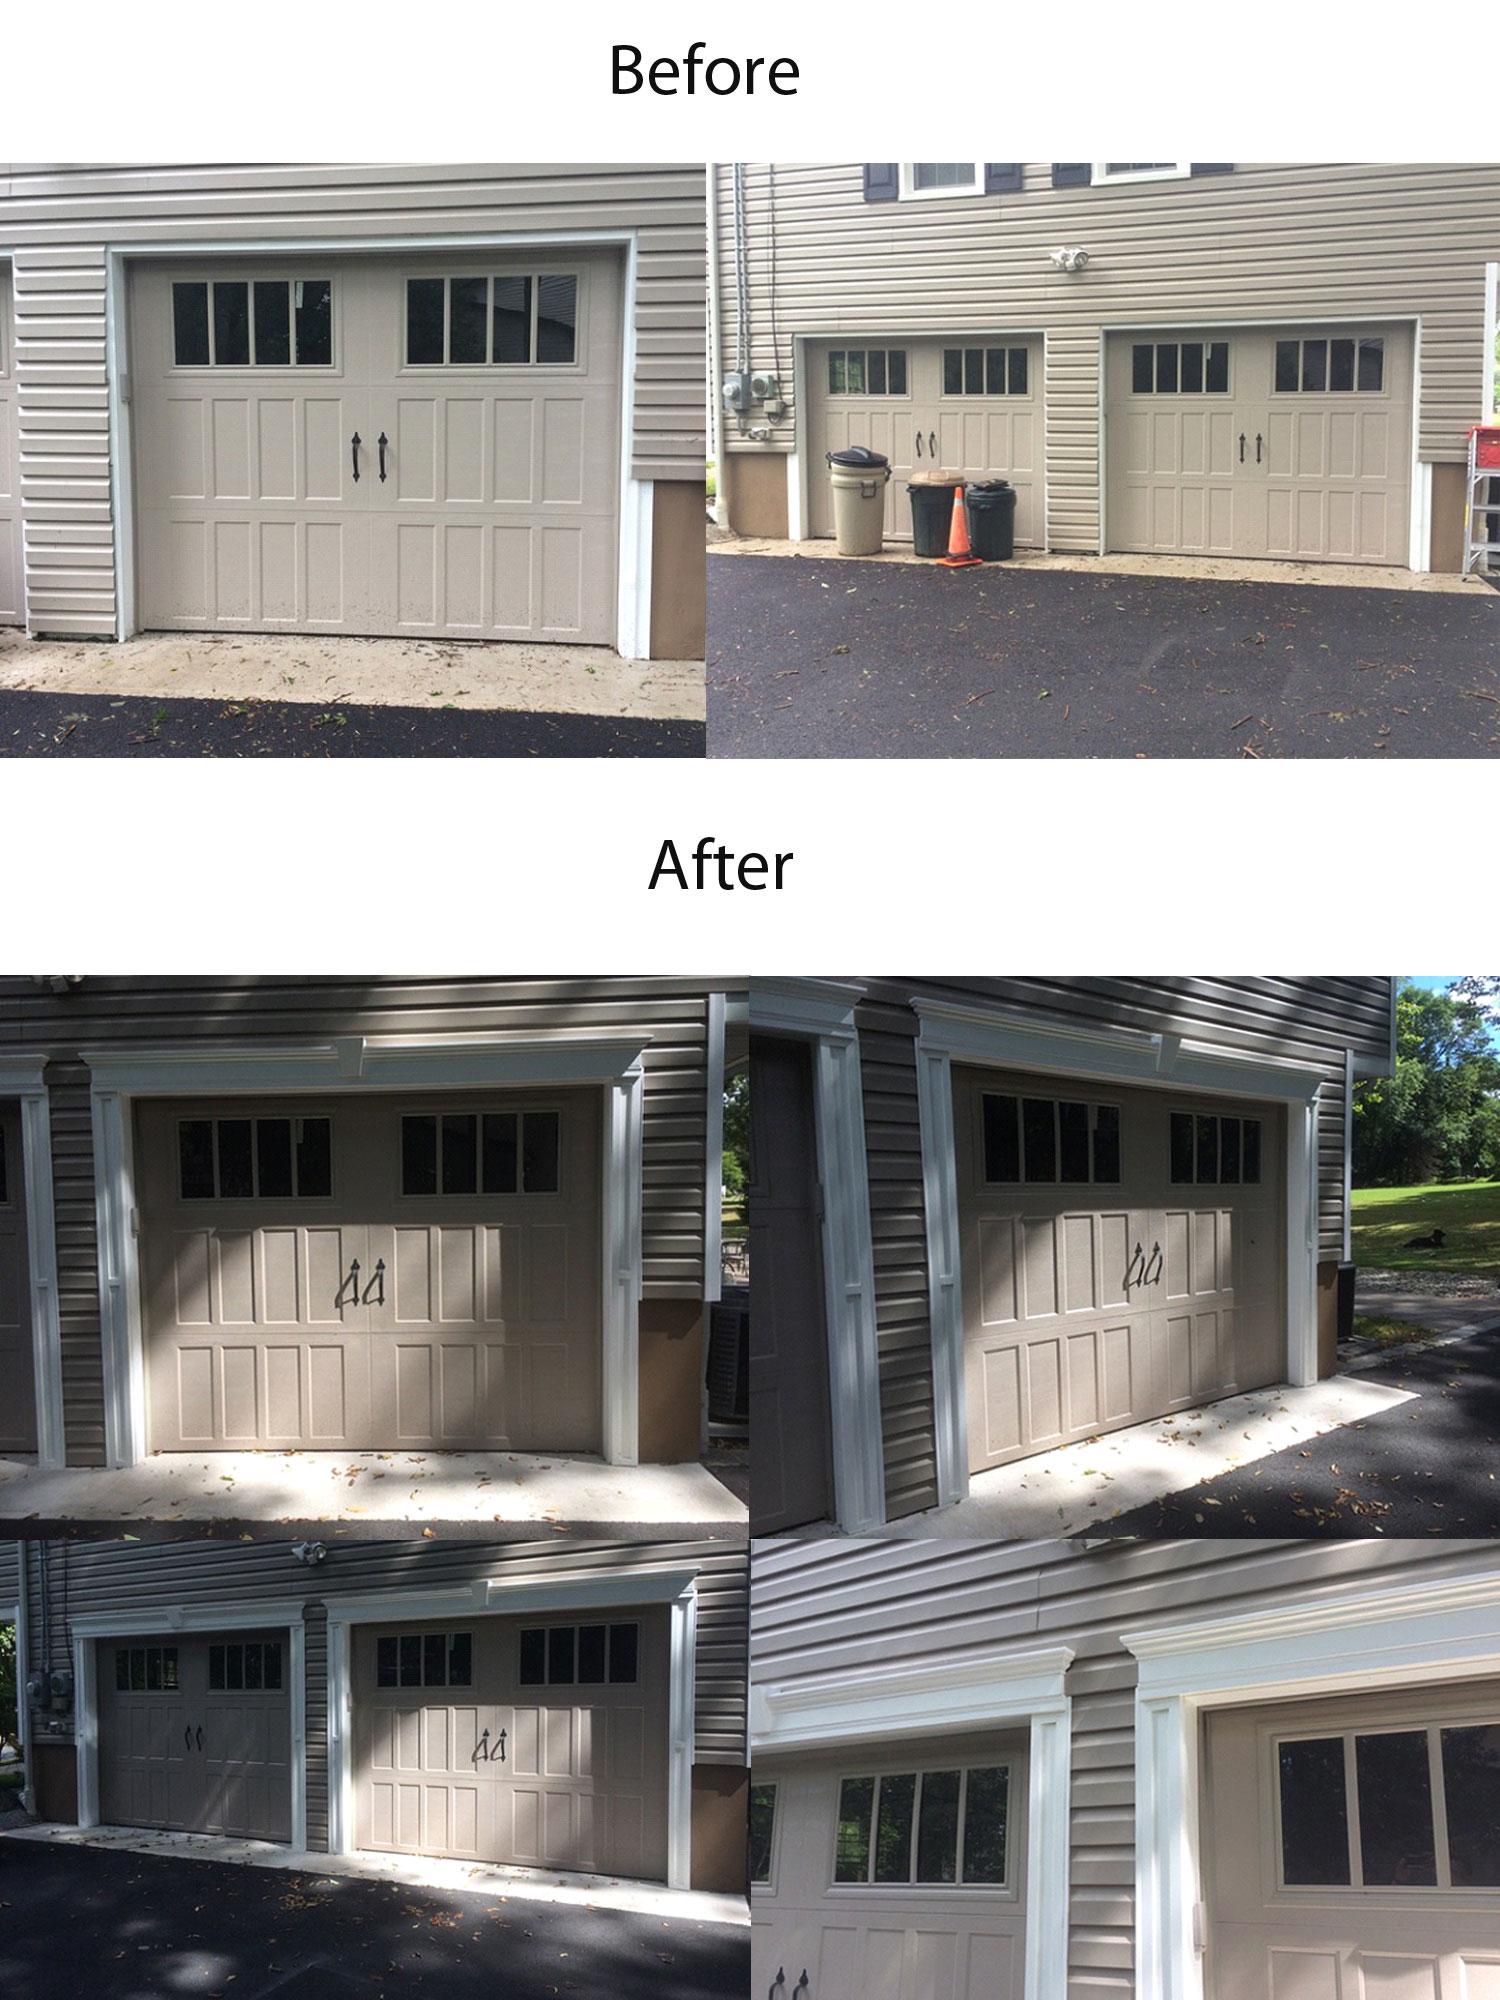 Crossheads Garage Door Project Architectural Depot